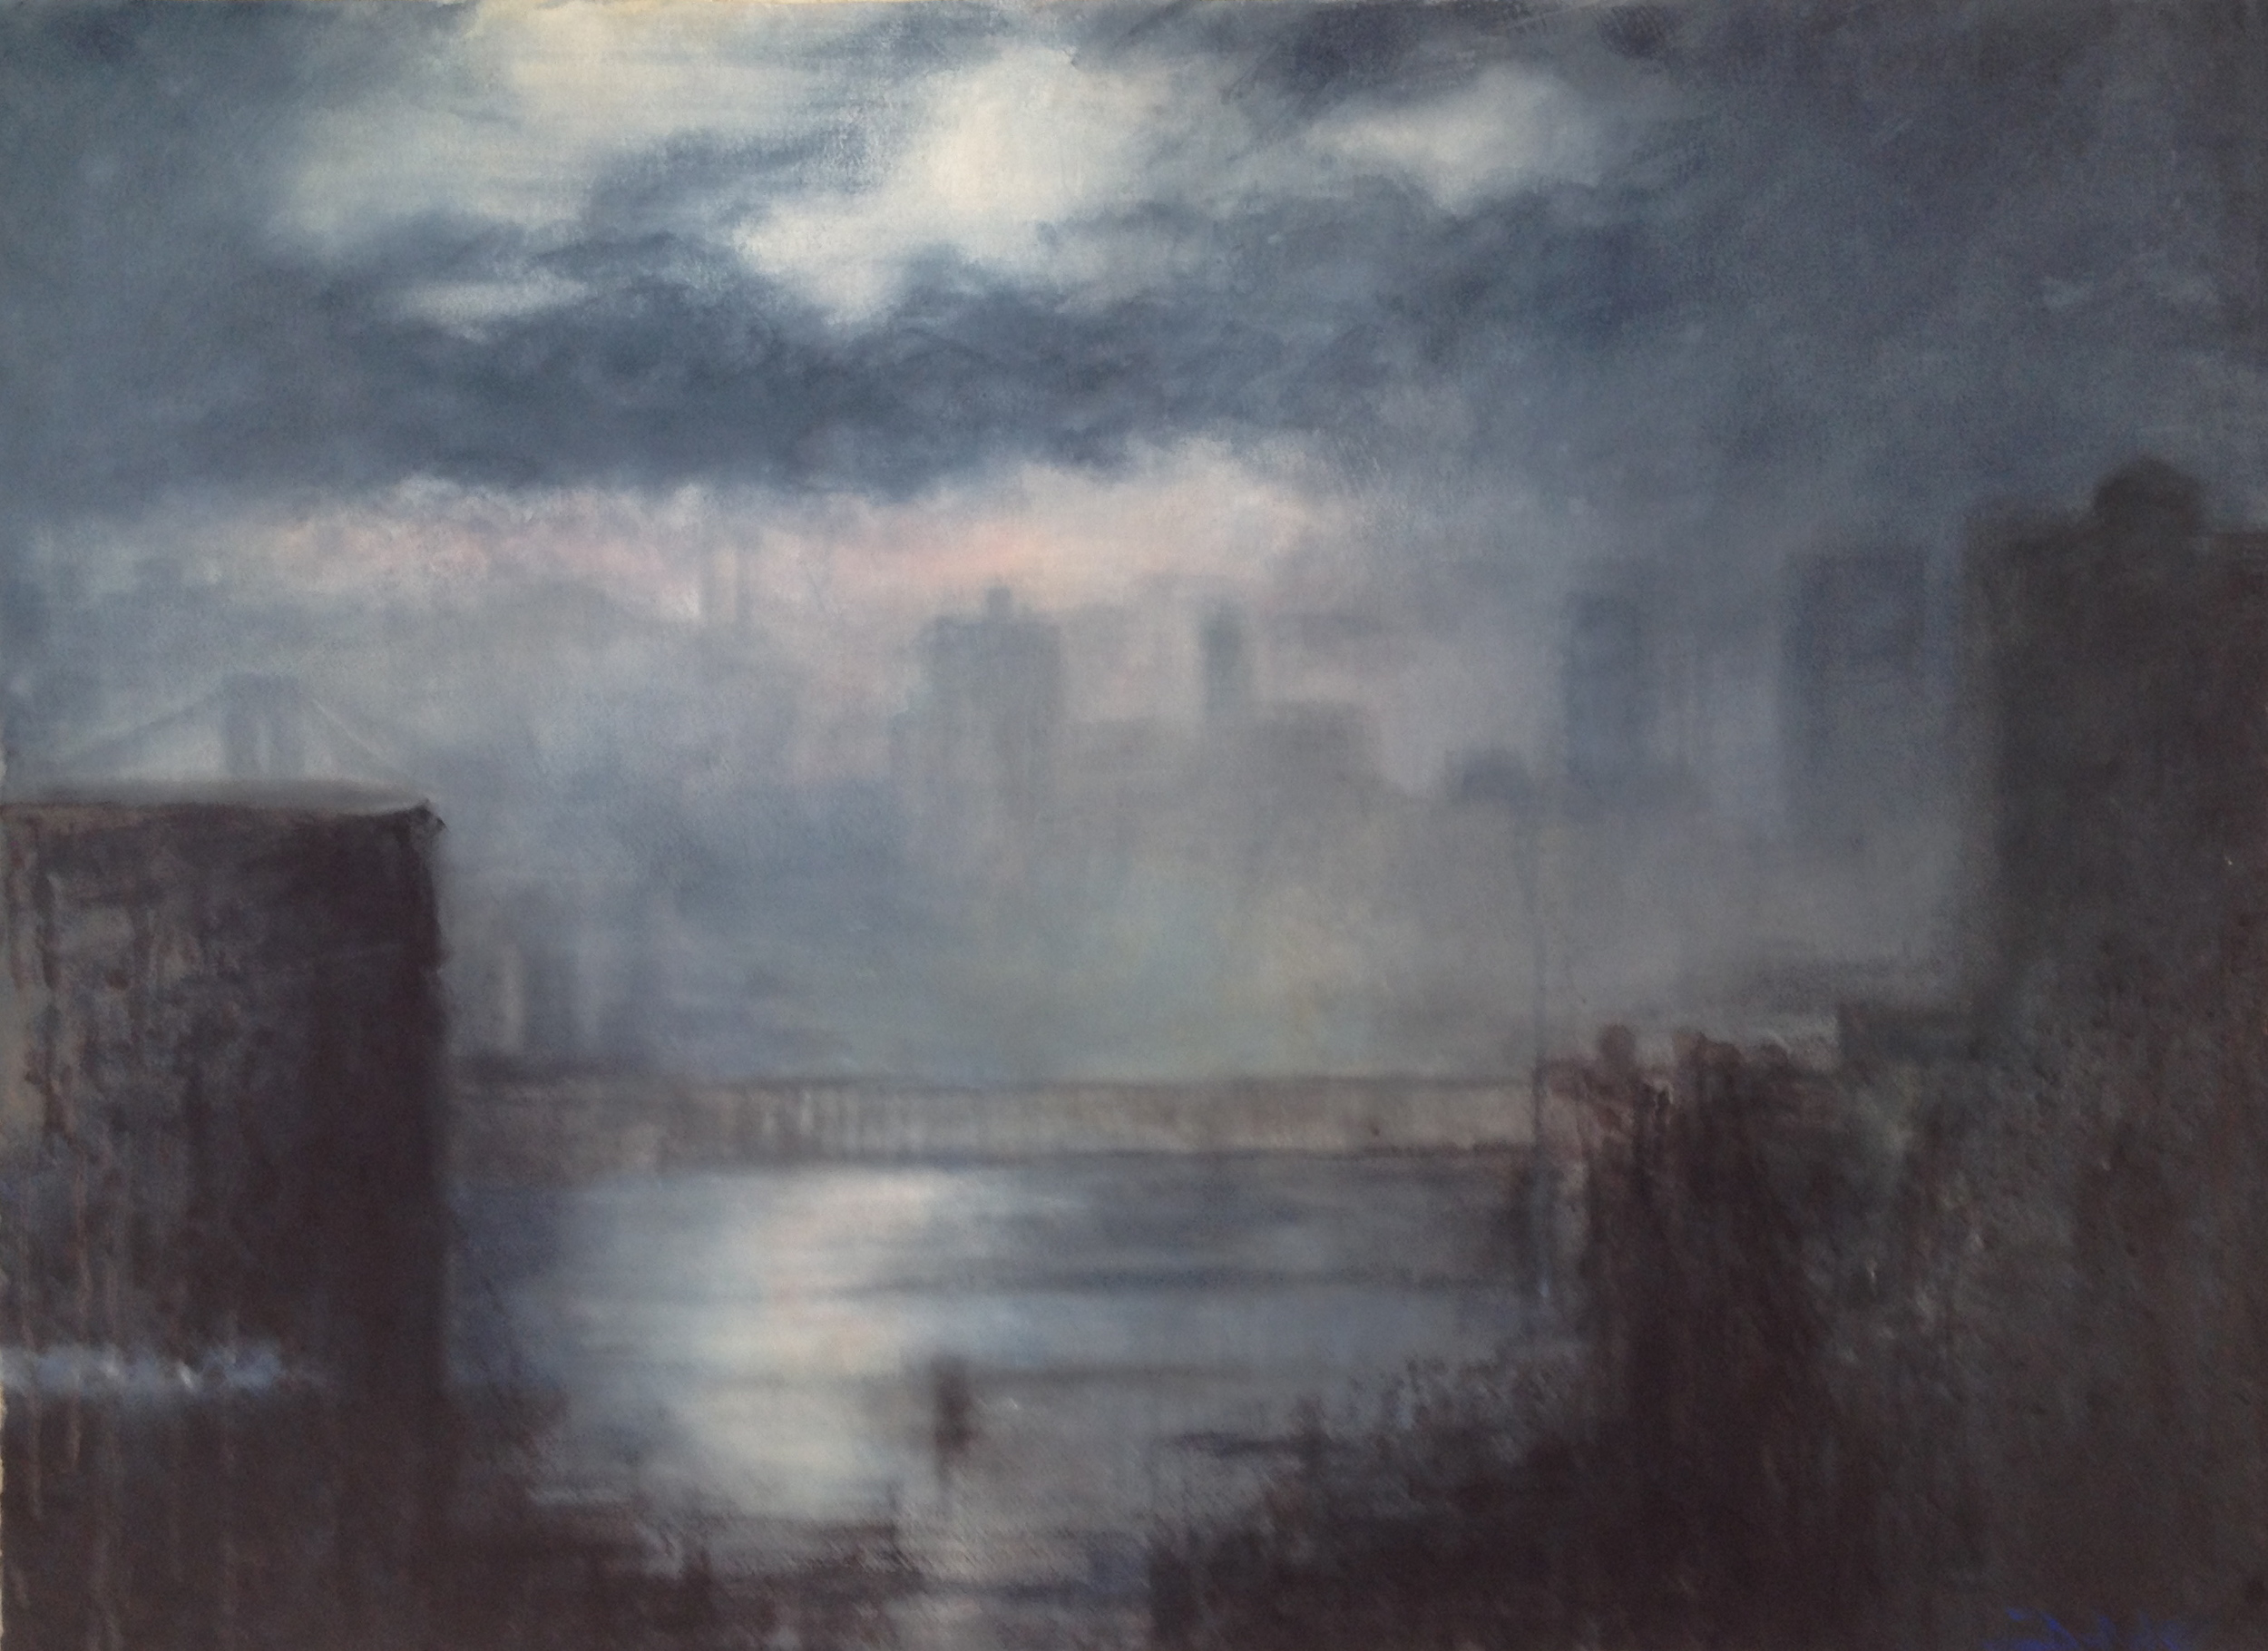 East River Dawn IV • 51.5 x 37.5